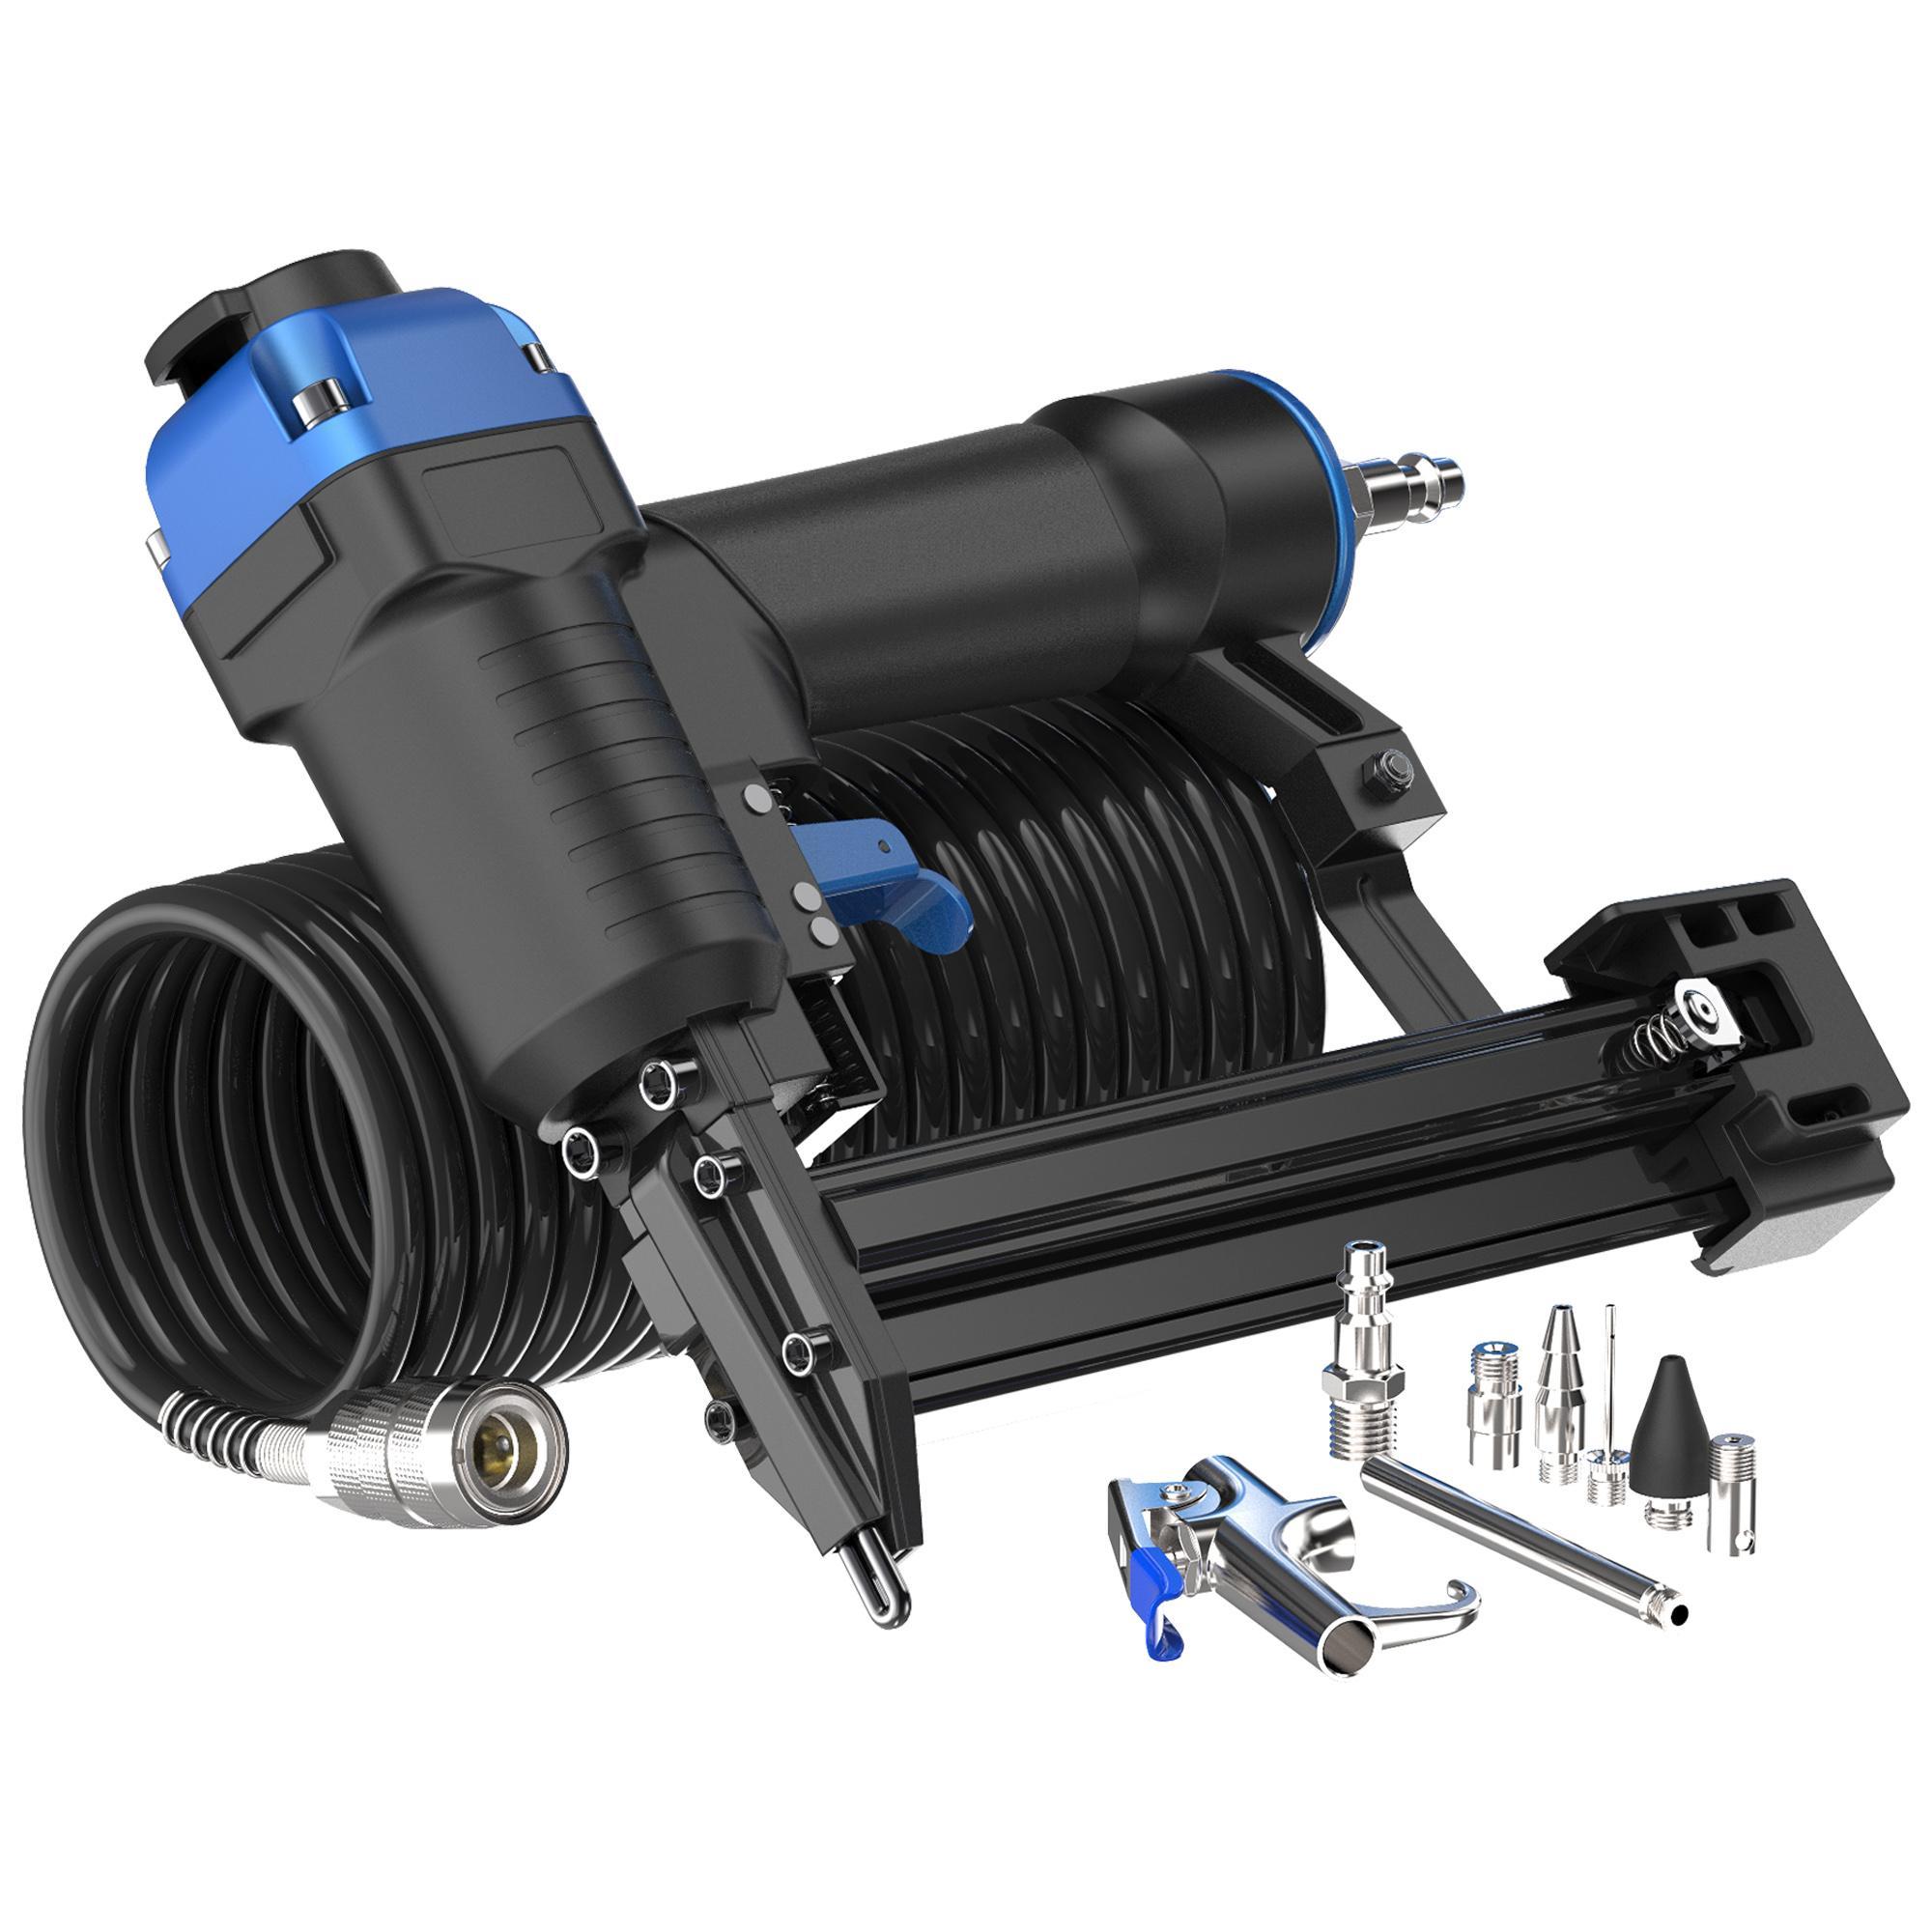 Hyundai Hhc2gnk Vertical Style Electric Air Compressor